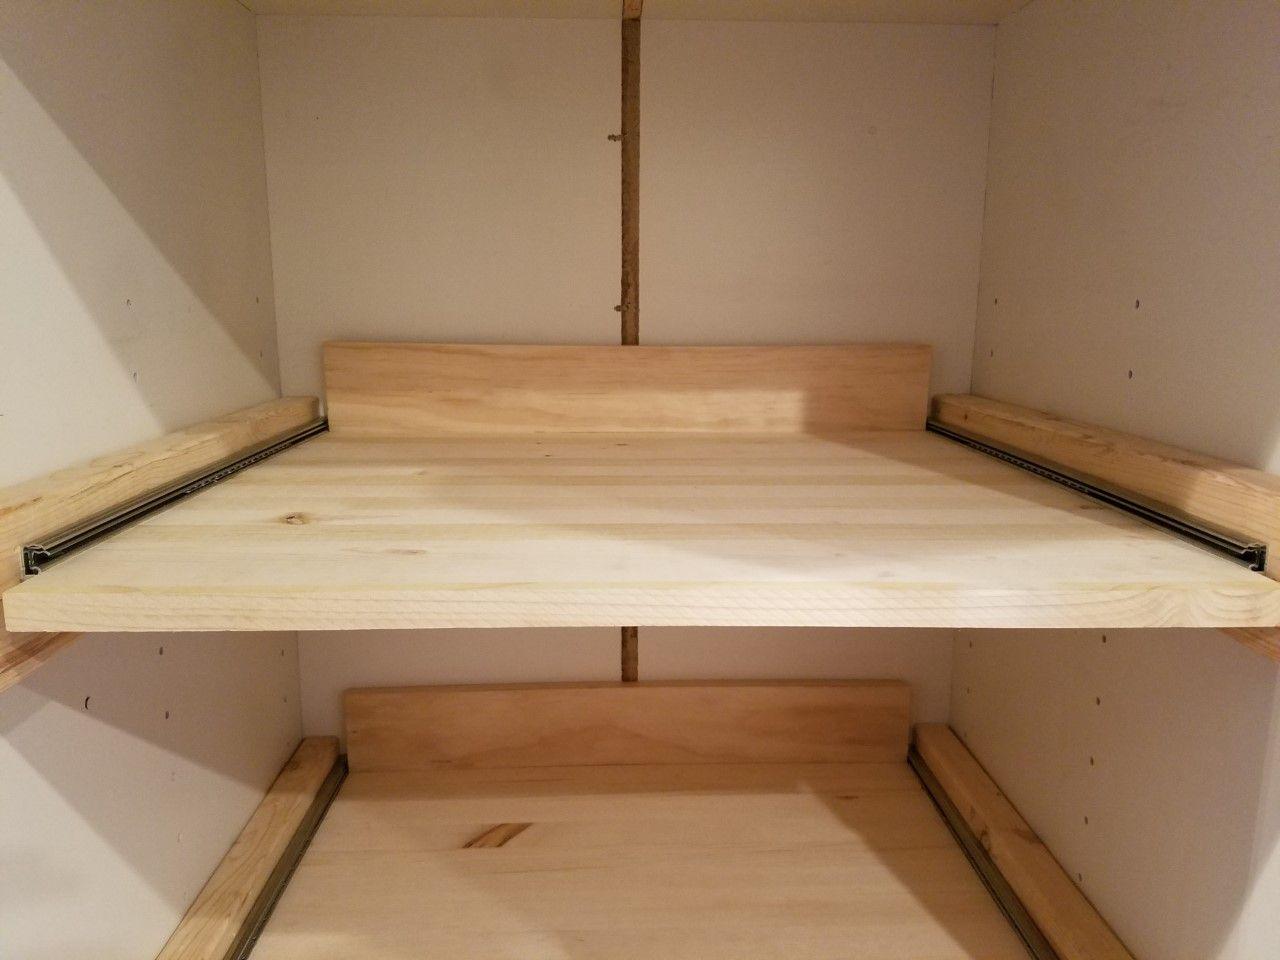 Diy sliding pantry shelves idyllic spaces diy pull out